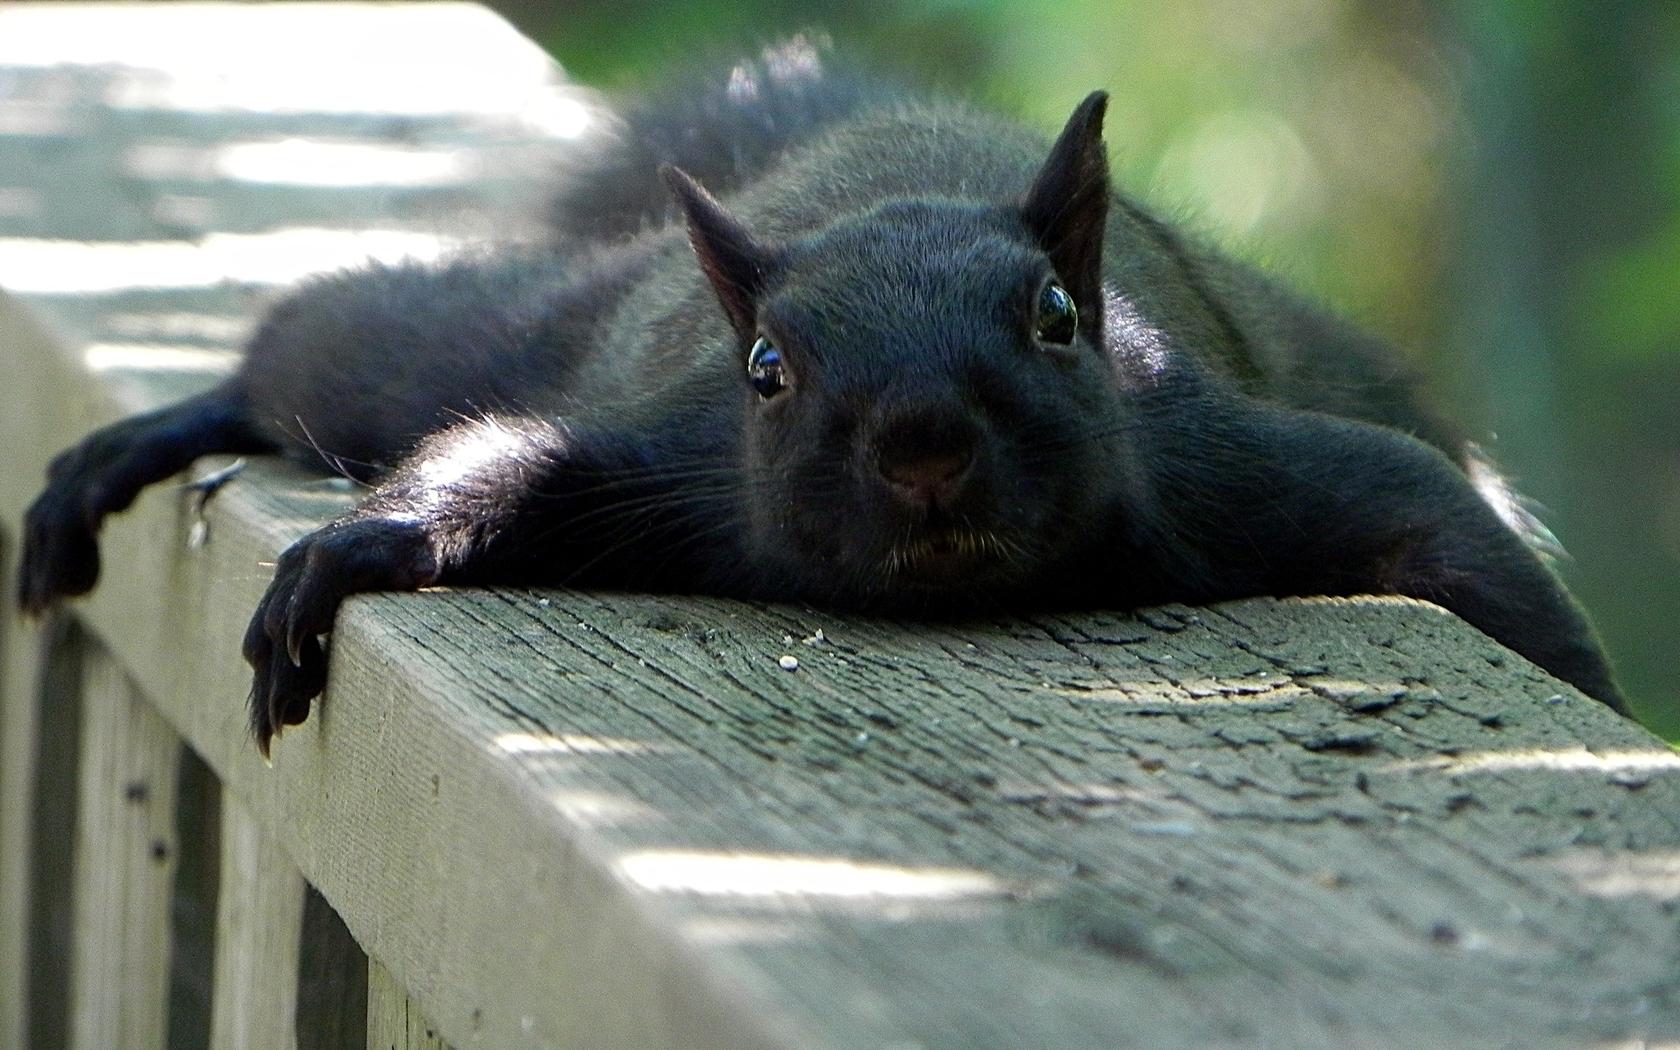 Animals funny squirrels (1680x1050)